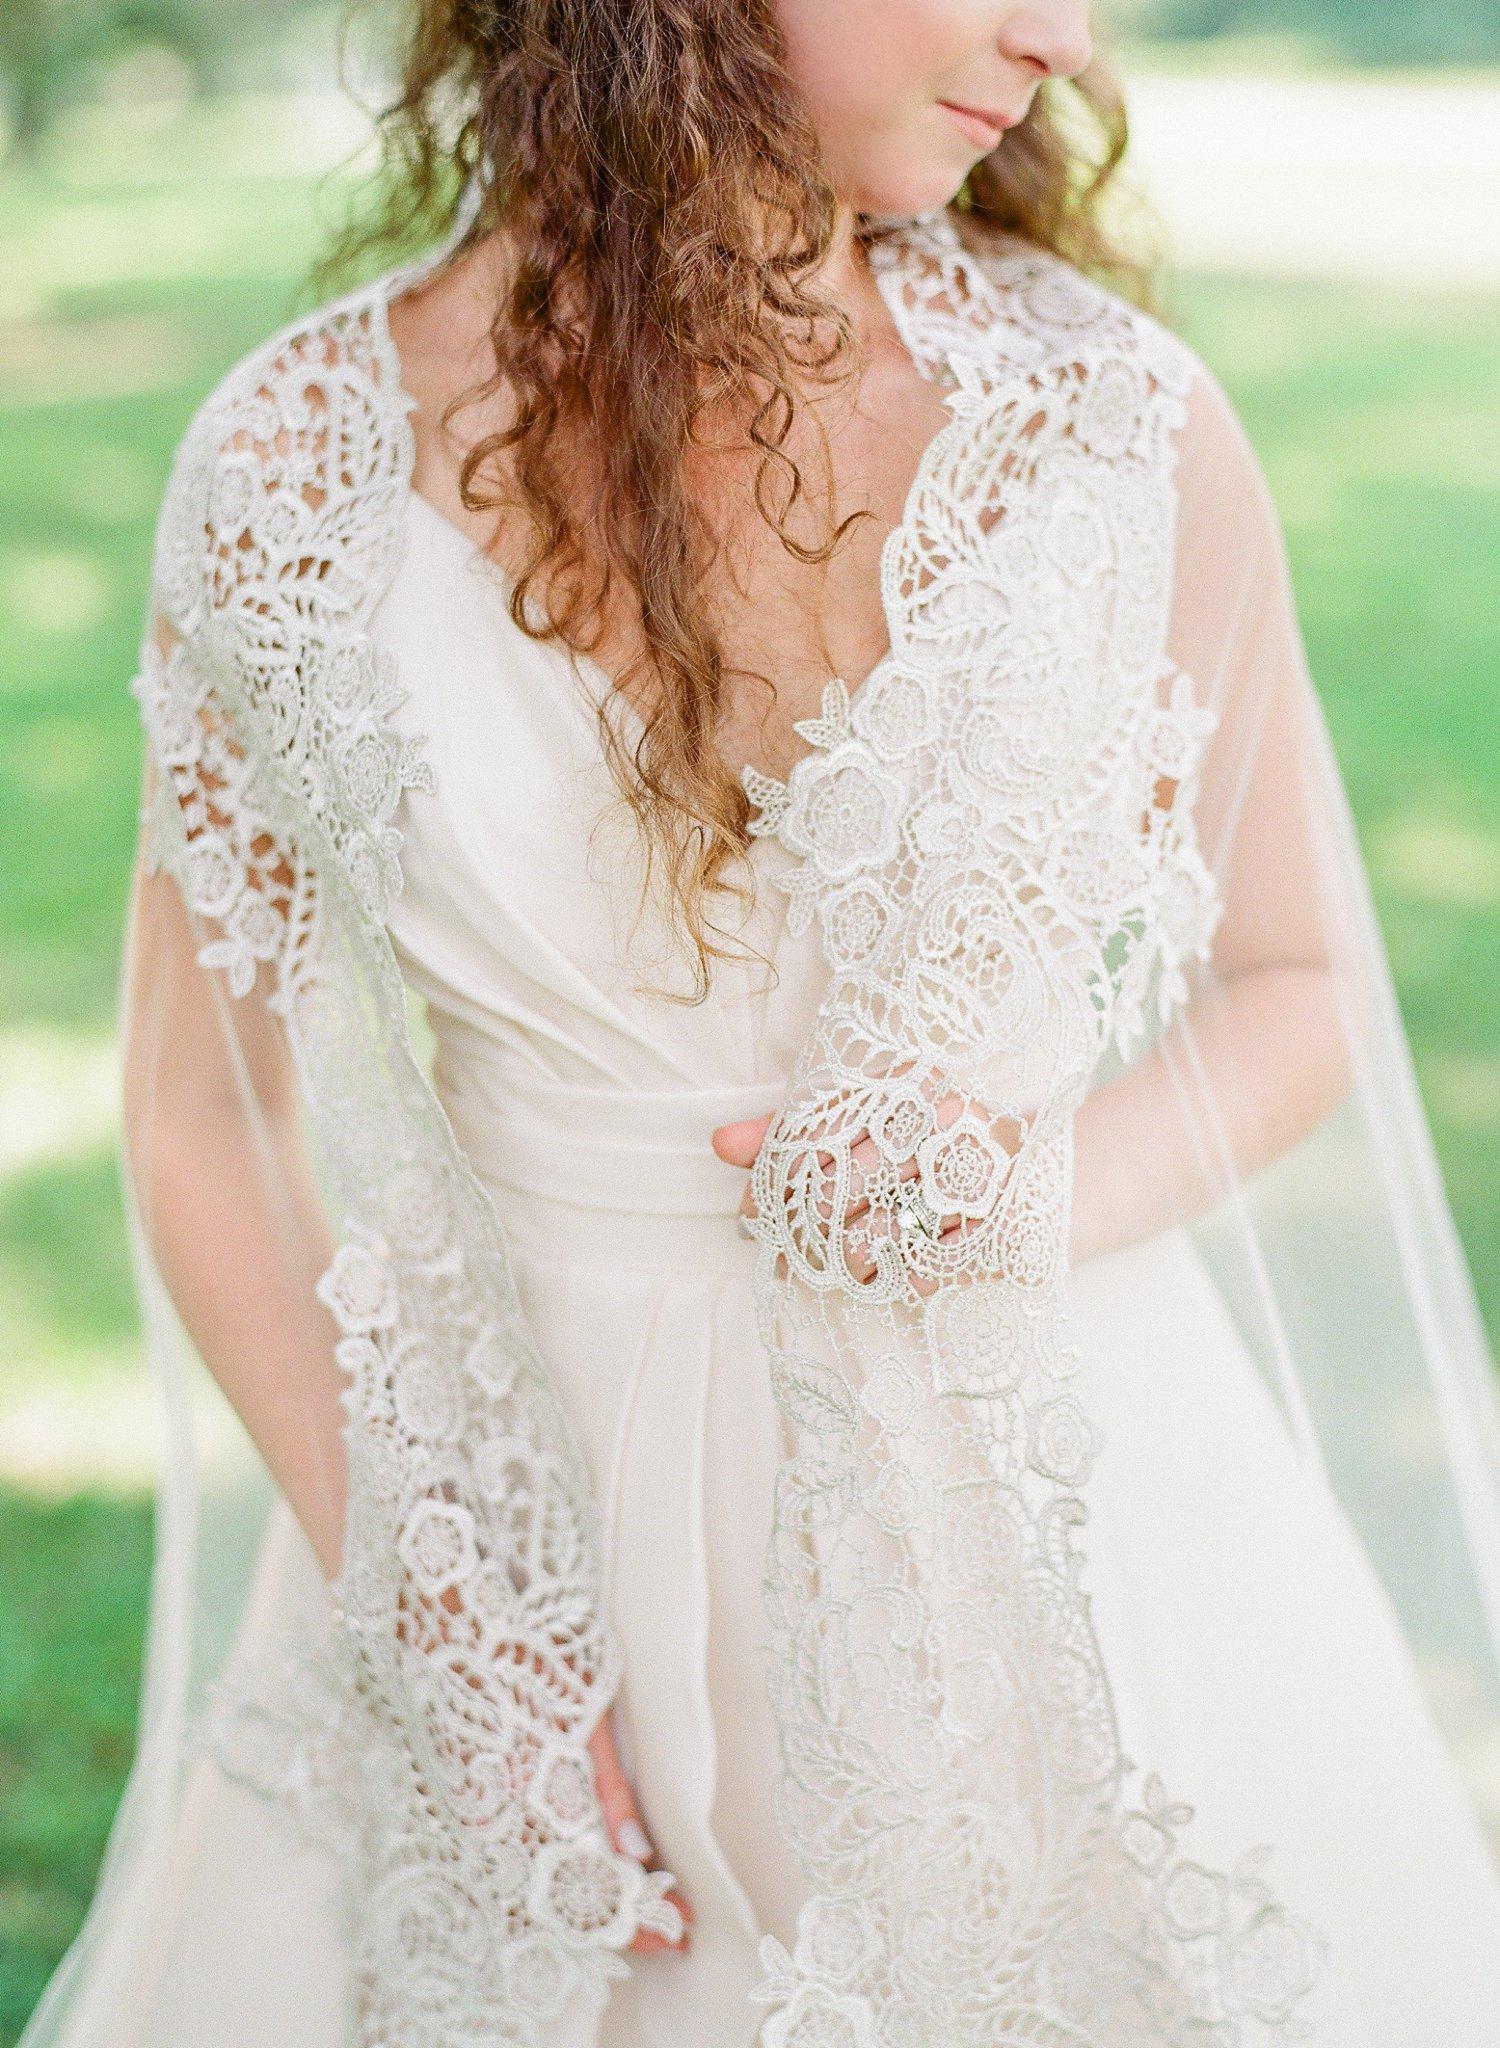 Carol Hannah Bridal L'Elysee Gazaar TSOS jodimillerphoto_031.JPG